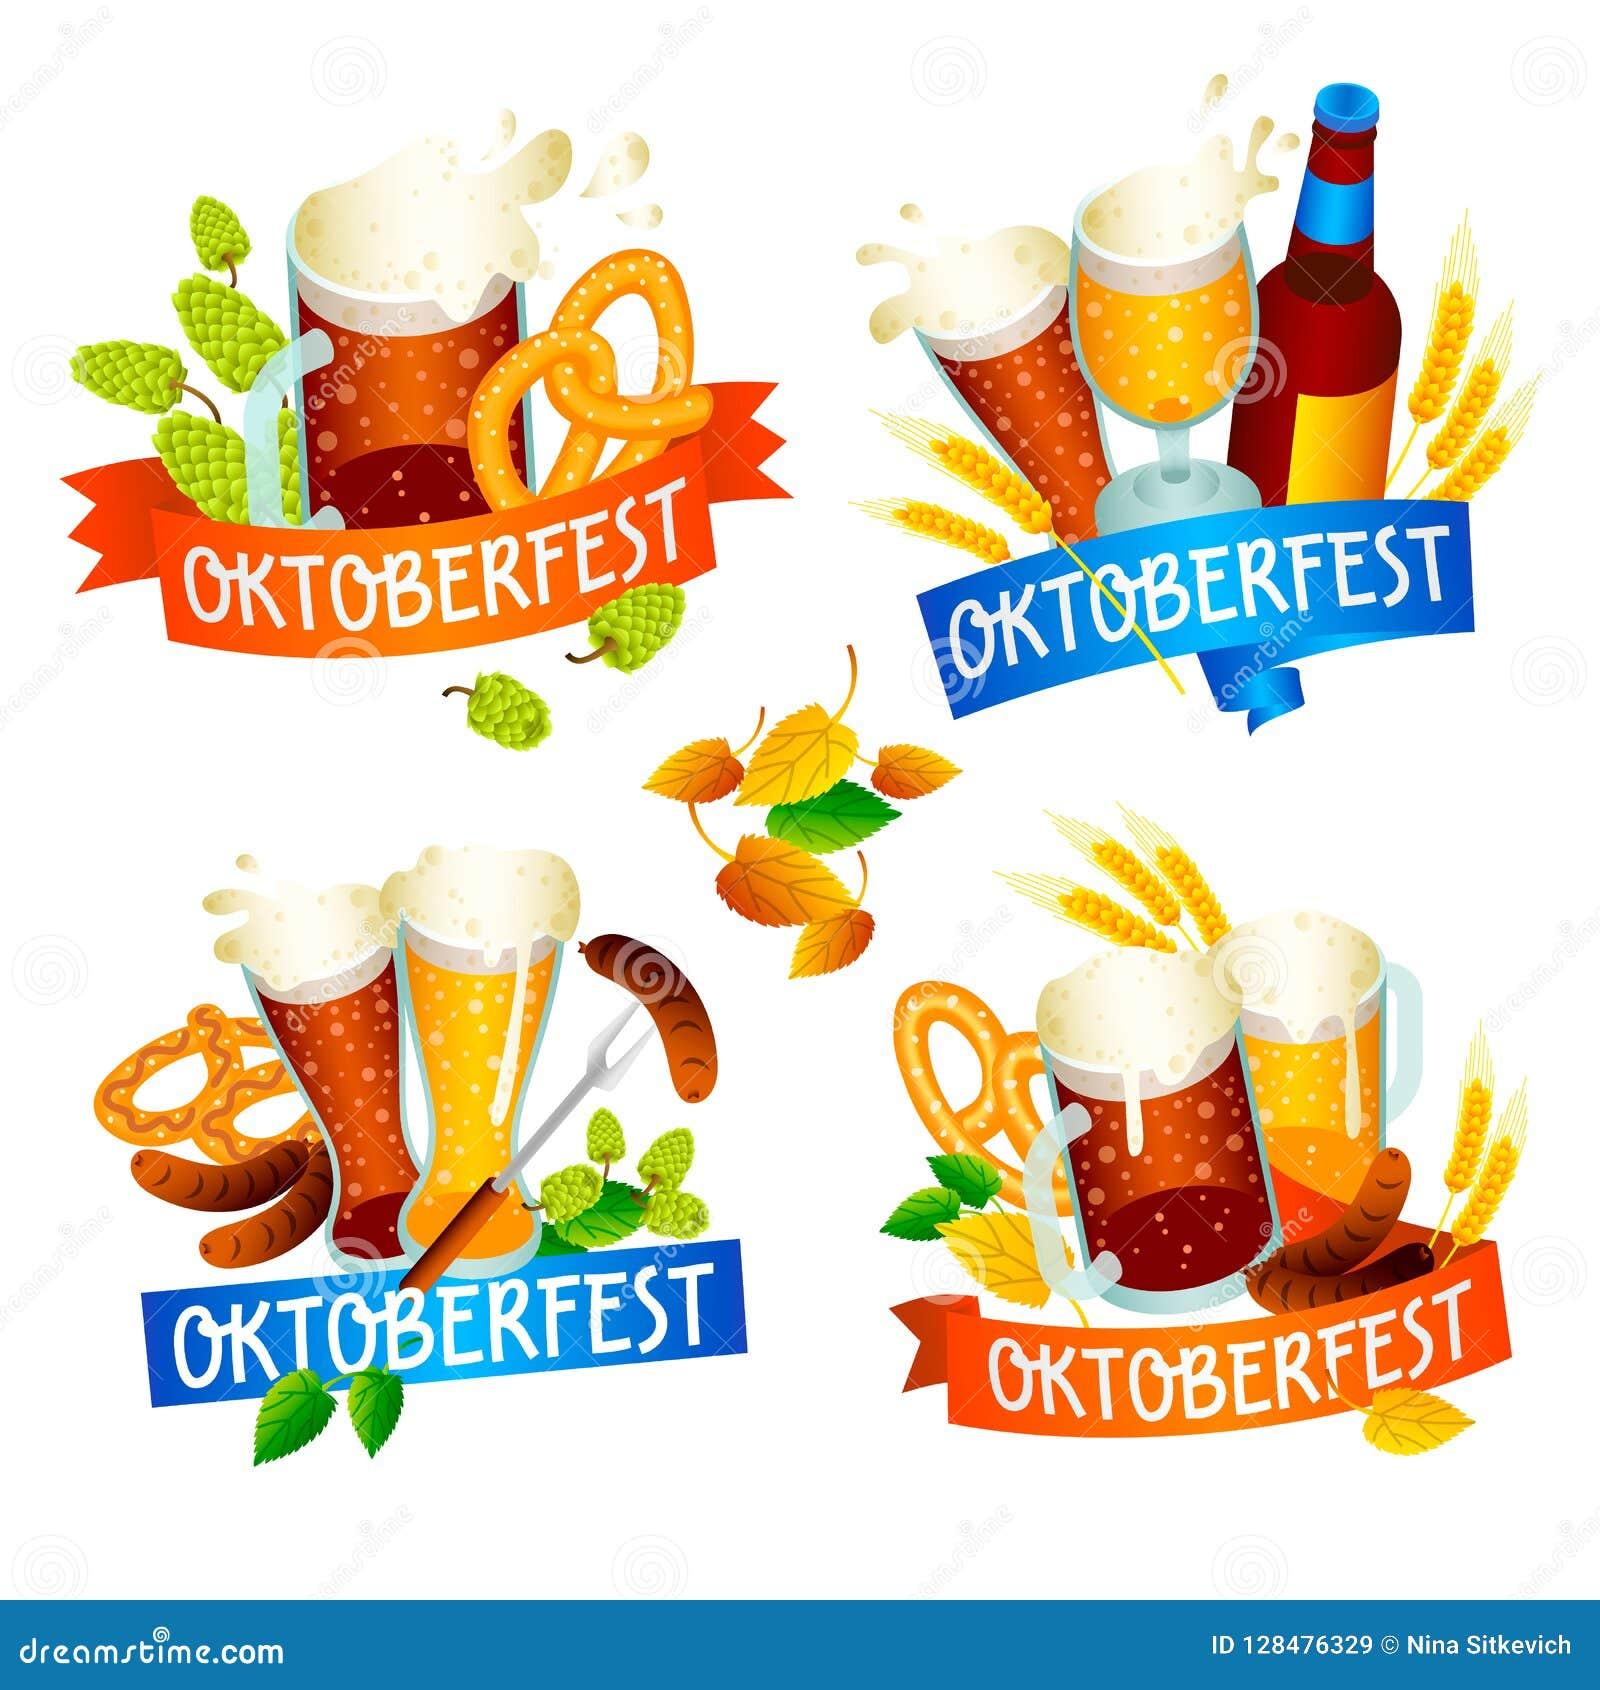 Oktoberfest banner set, isometric style